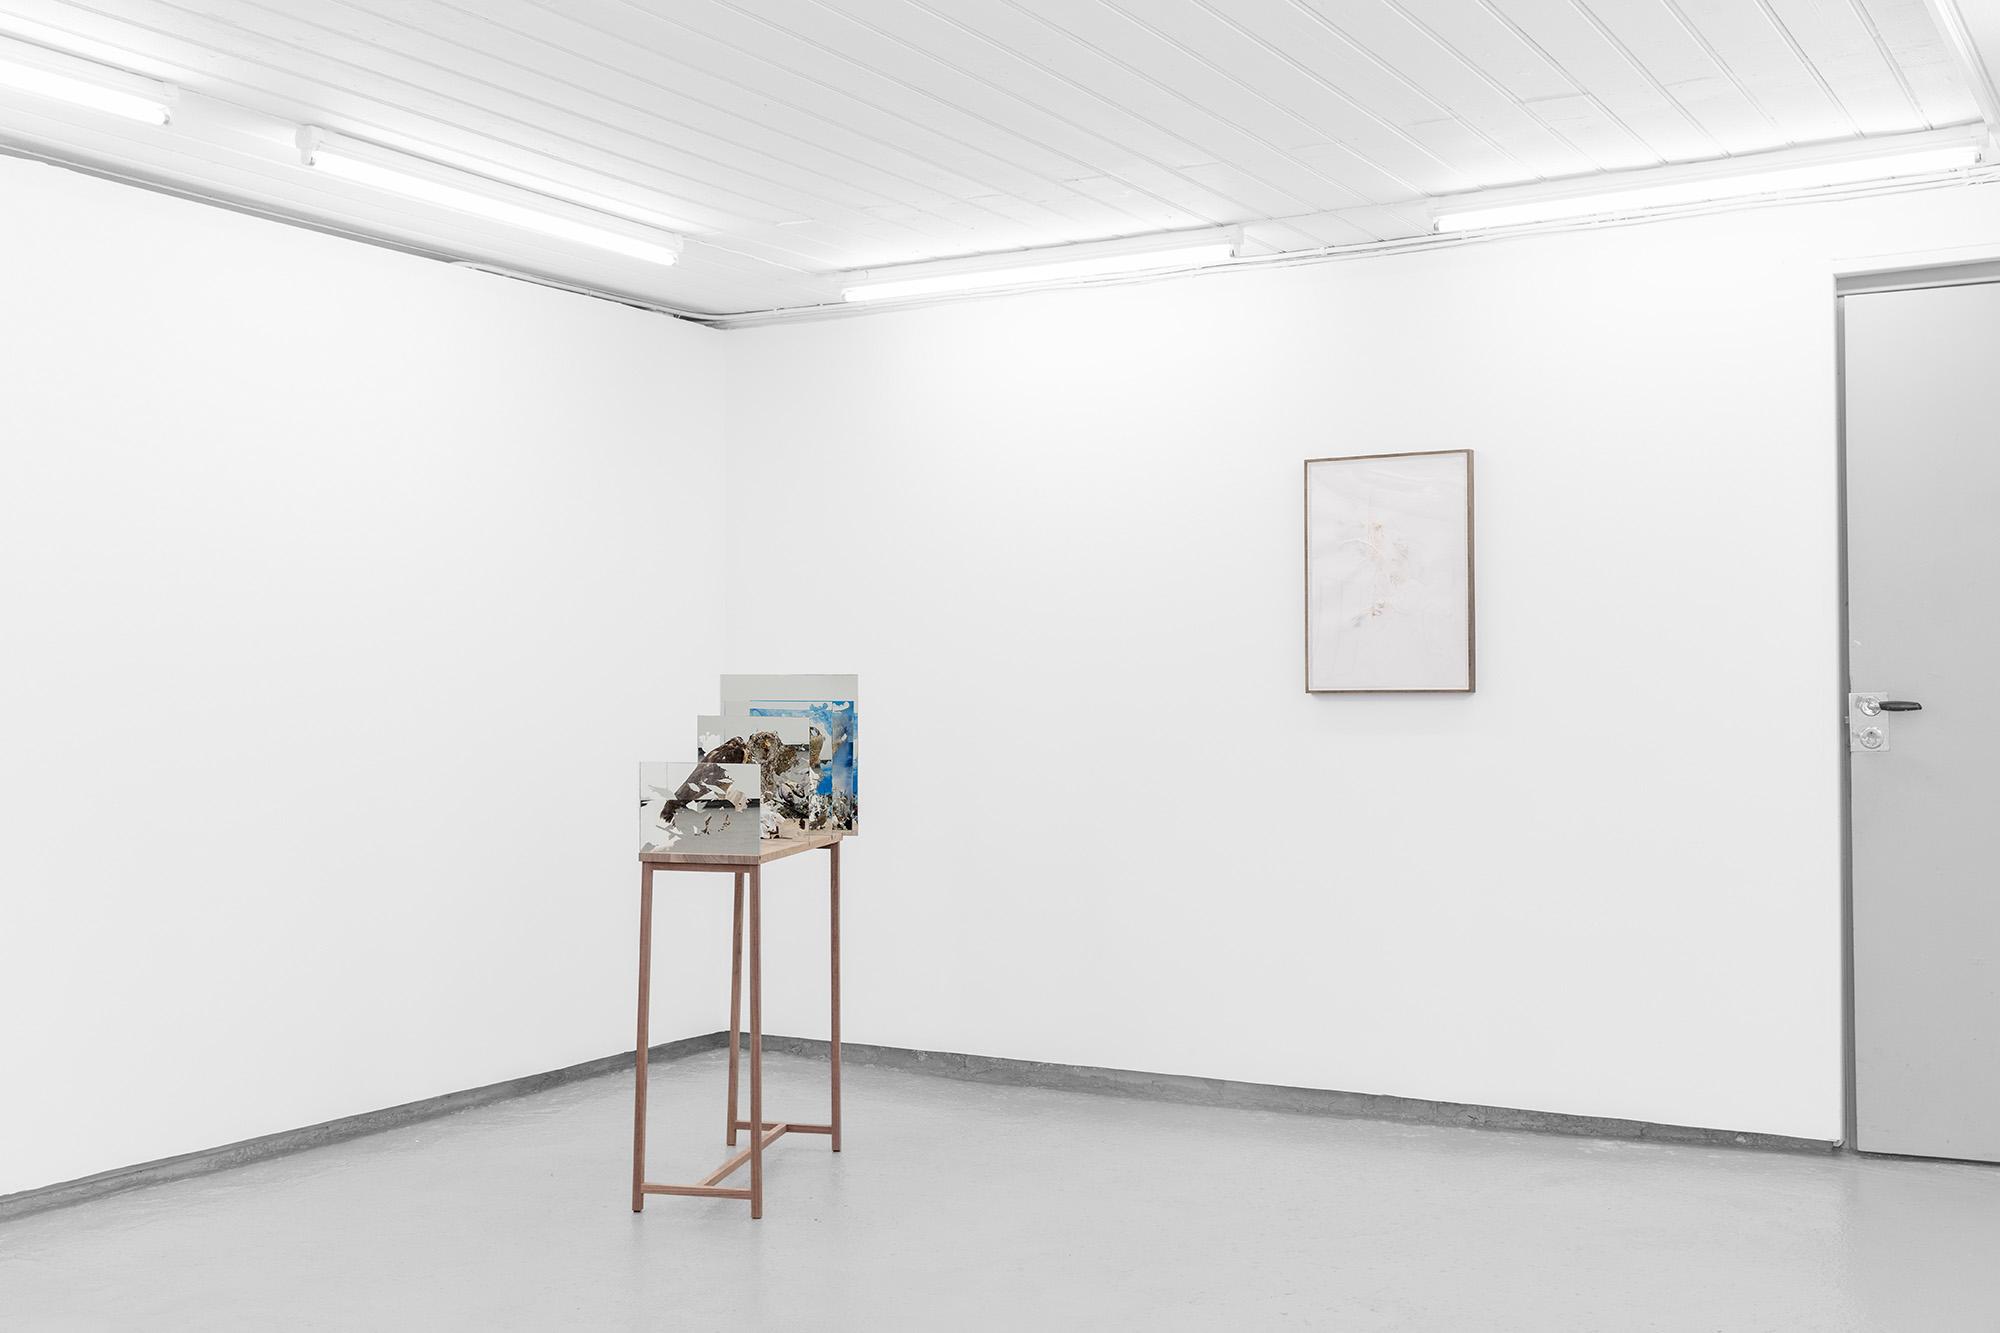 Randi Nygård / TOKONOMA at MELK 2019